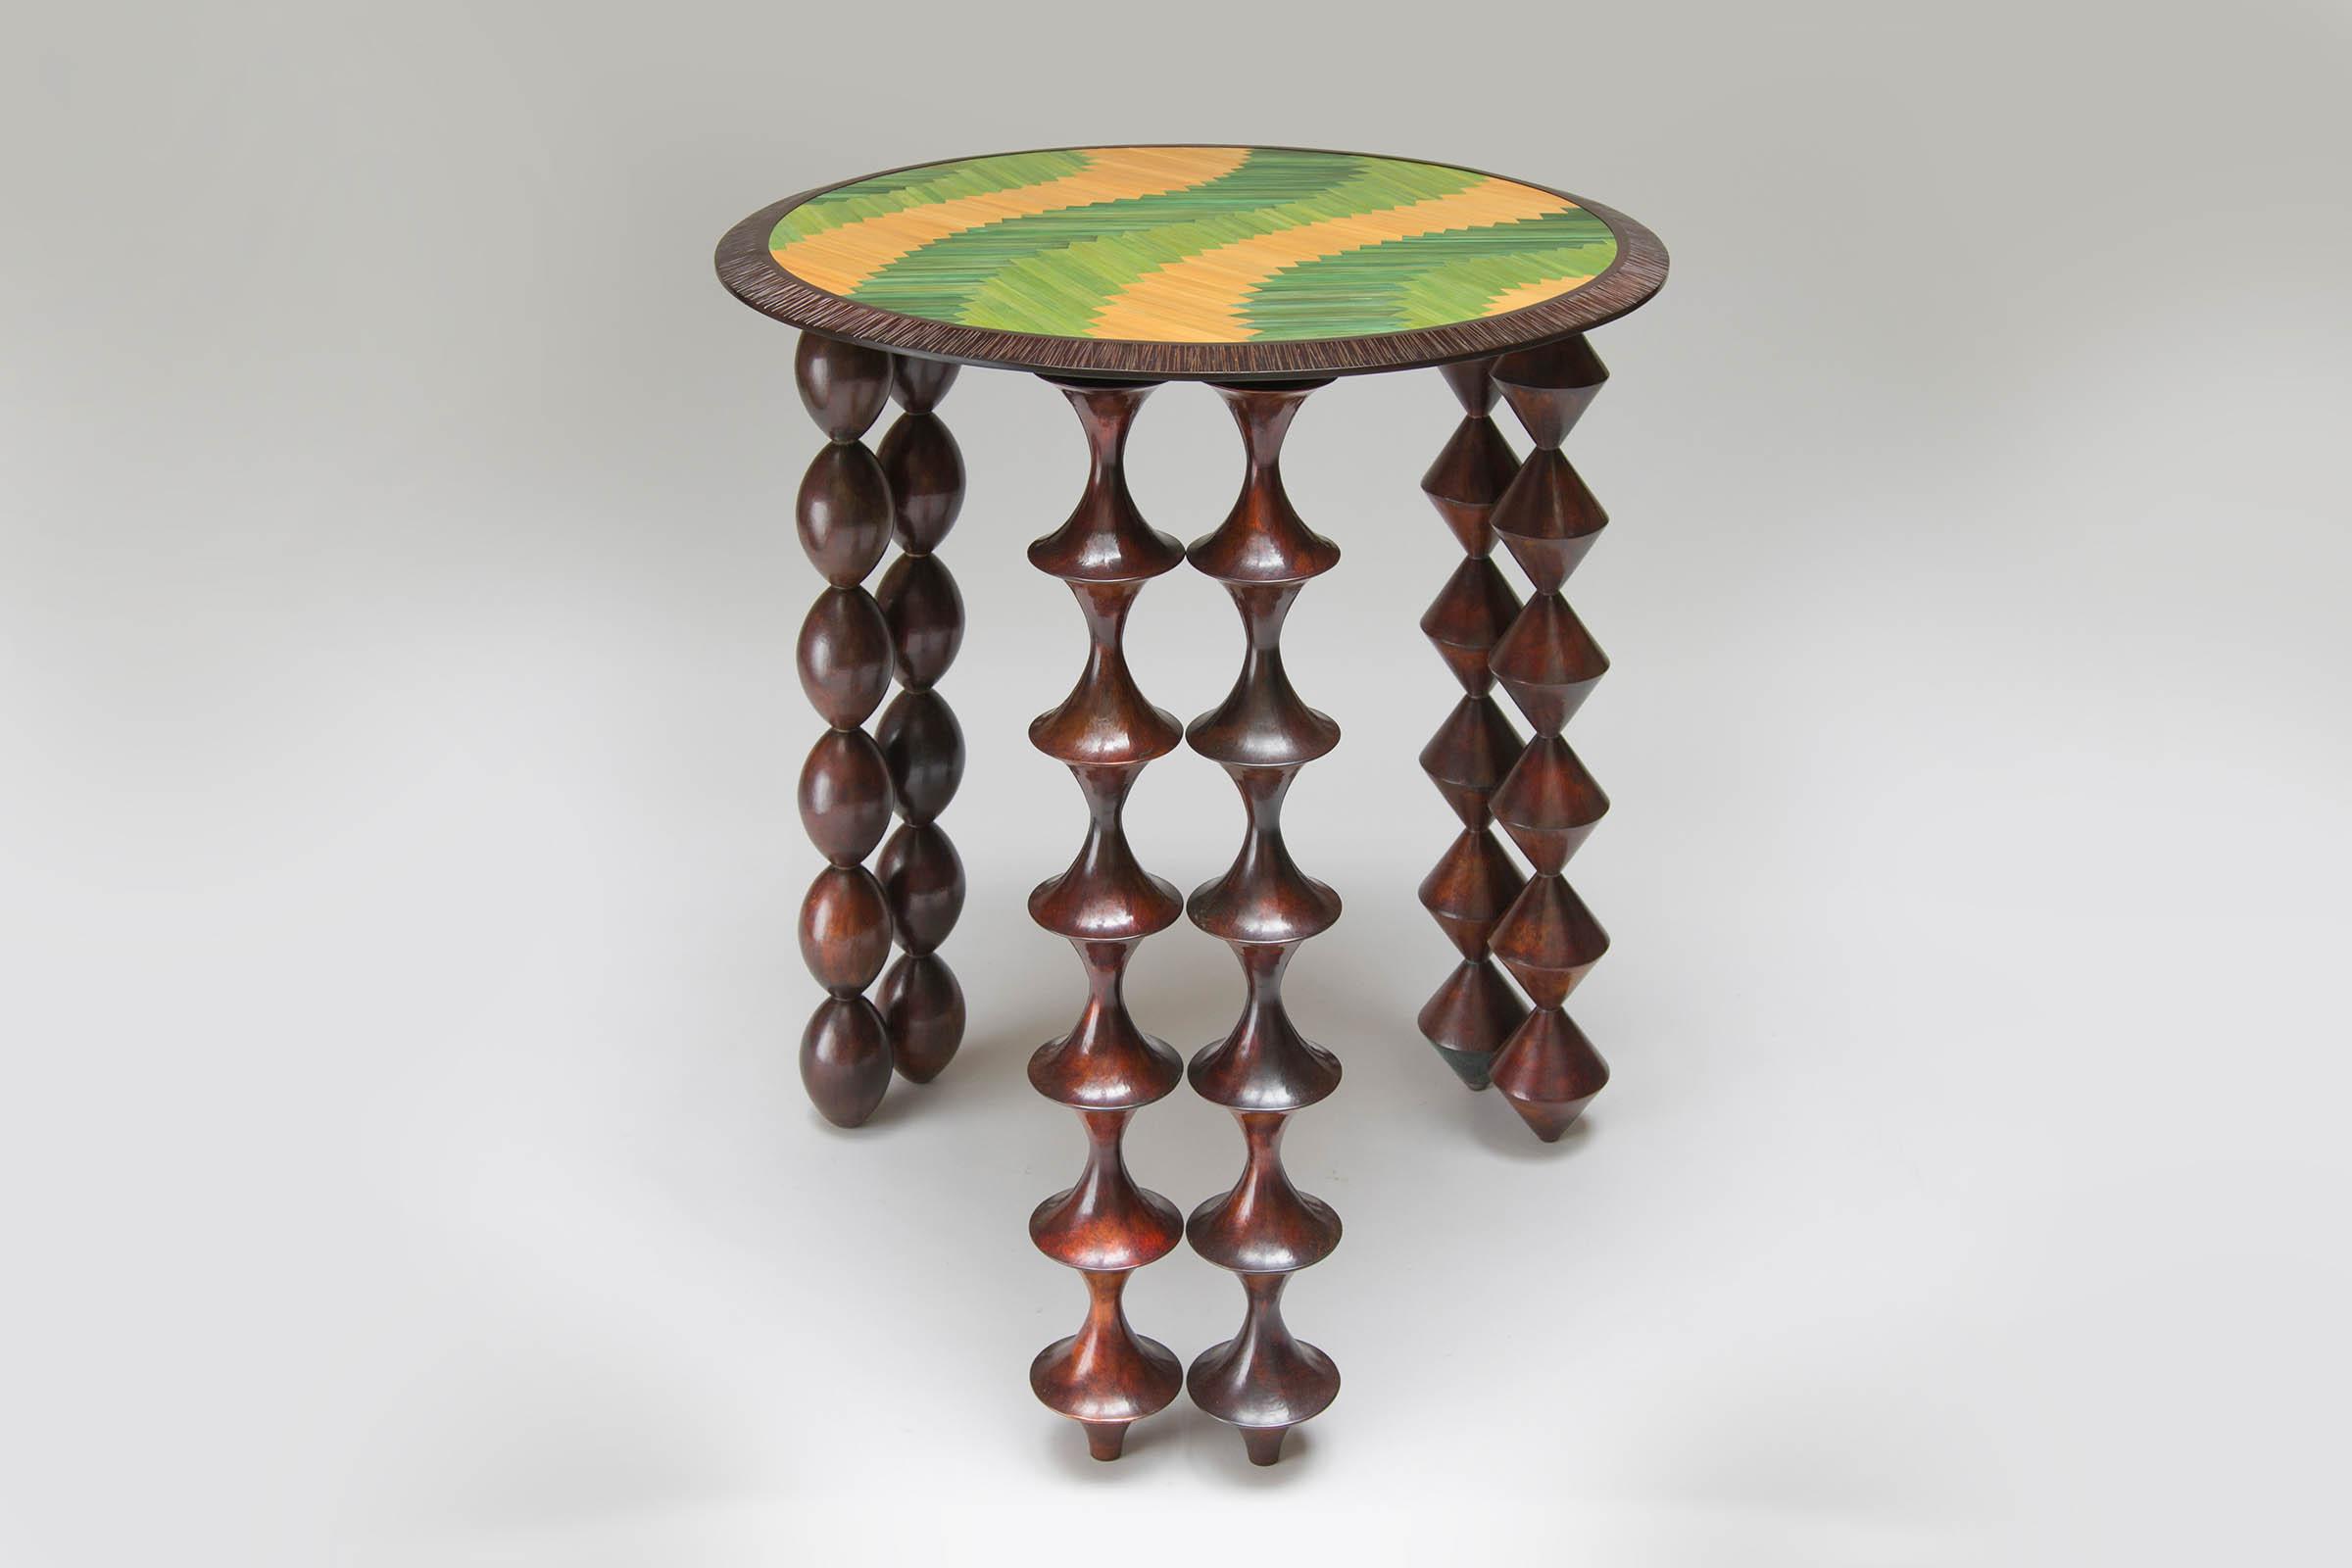 Nathanael le berre cheyennes table nathanael le berre opera table geotapseo Gallery